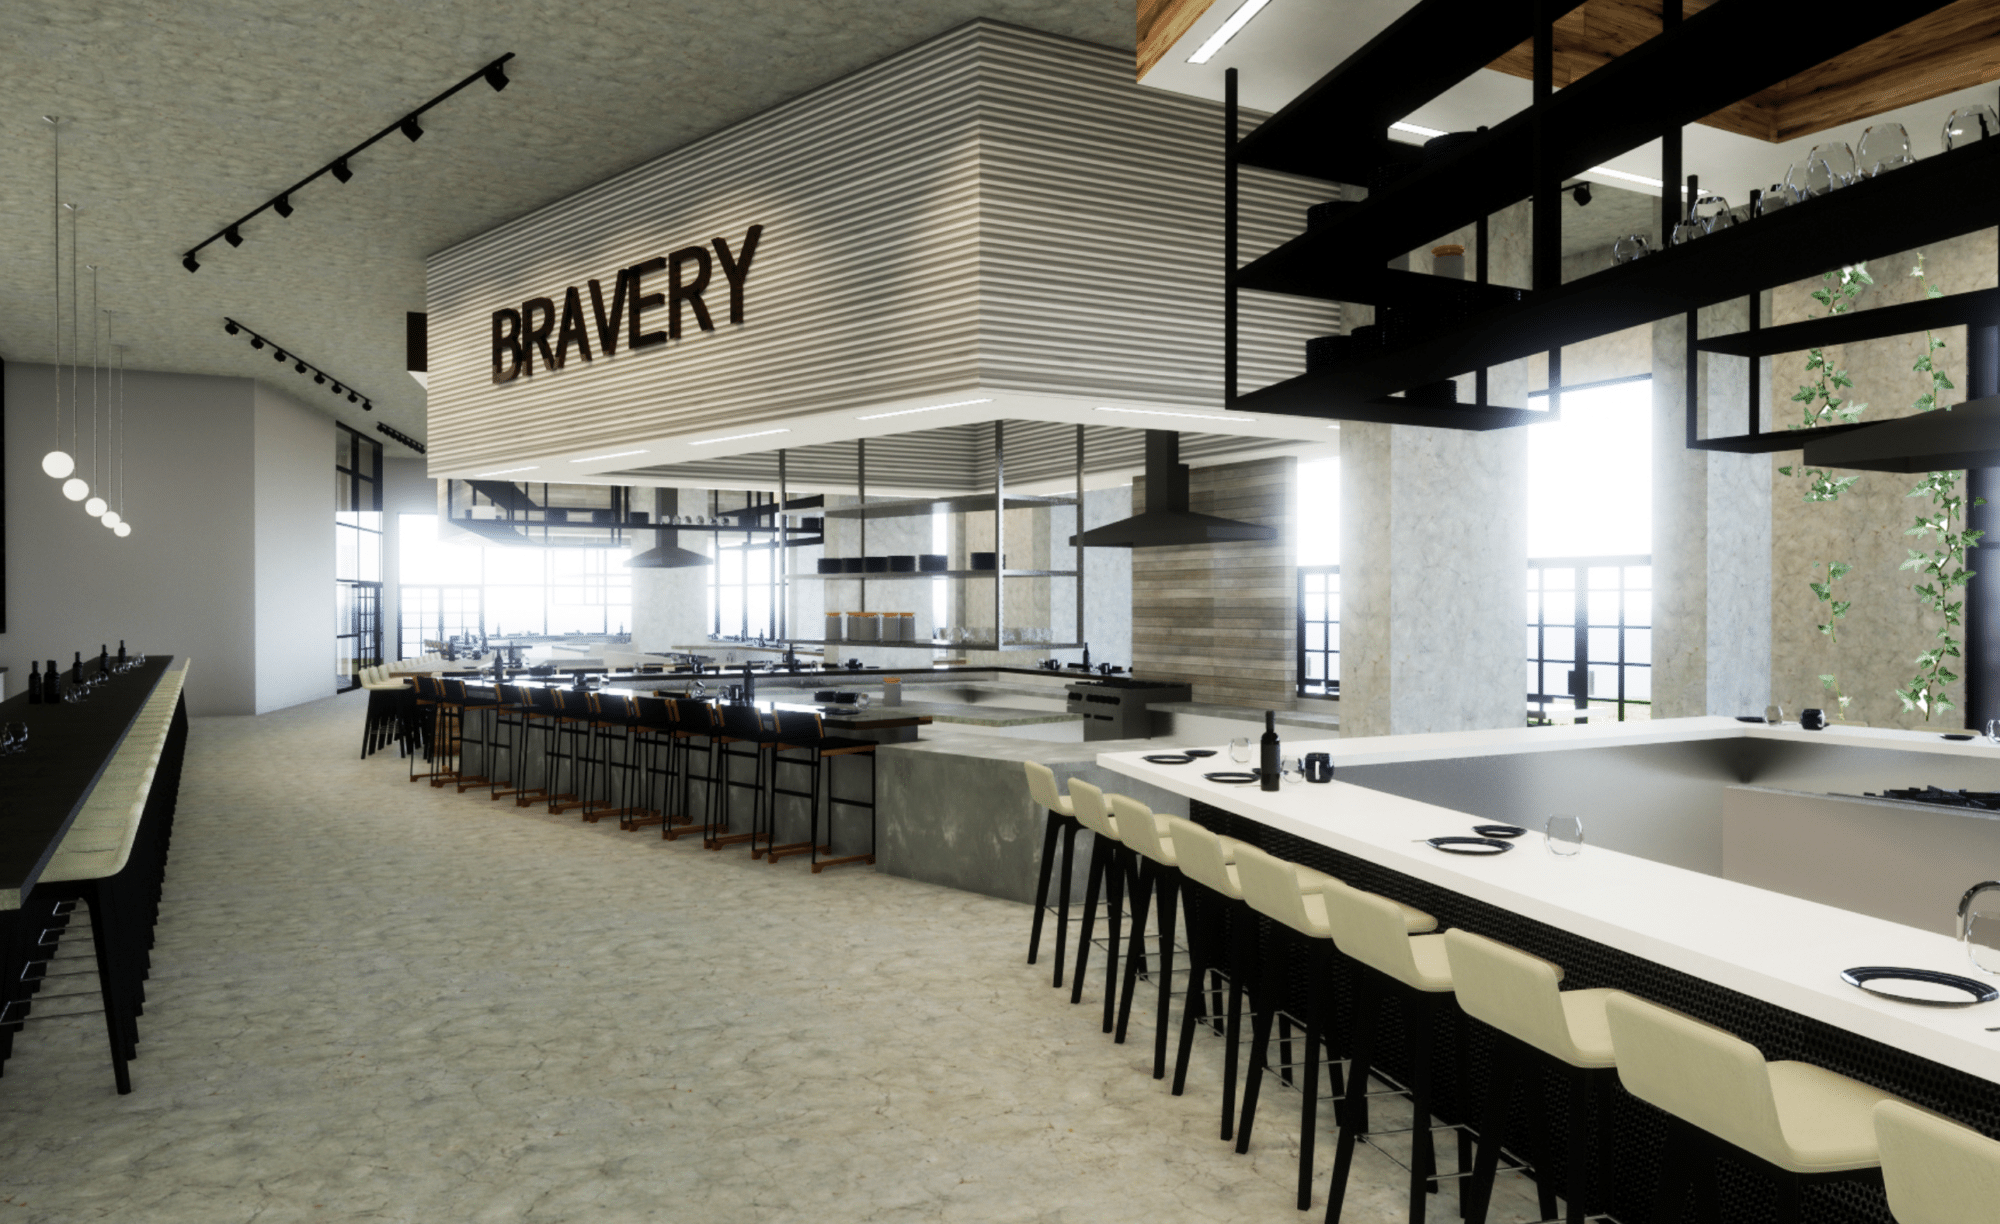 Bravery Chef Hall Houston Food Scene Porcelain Countertops